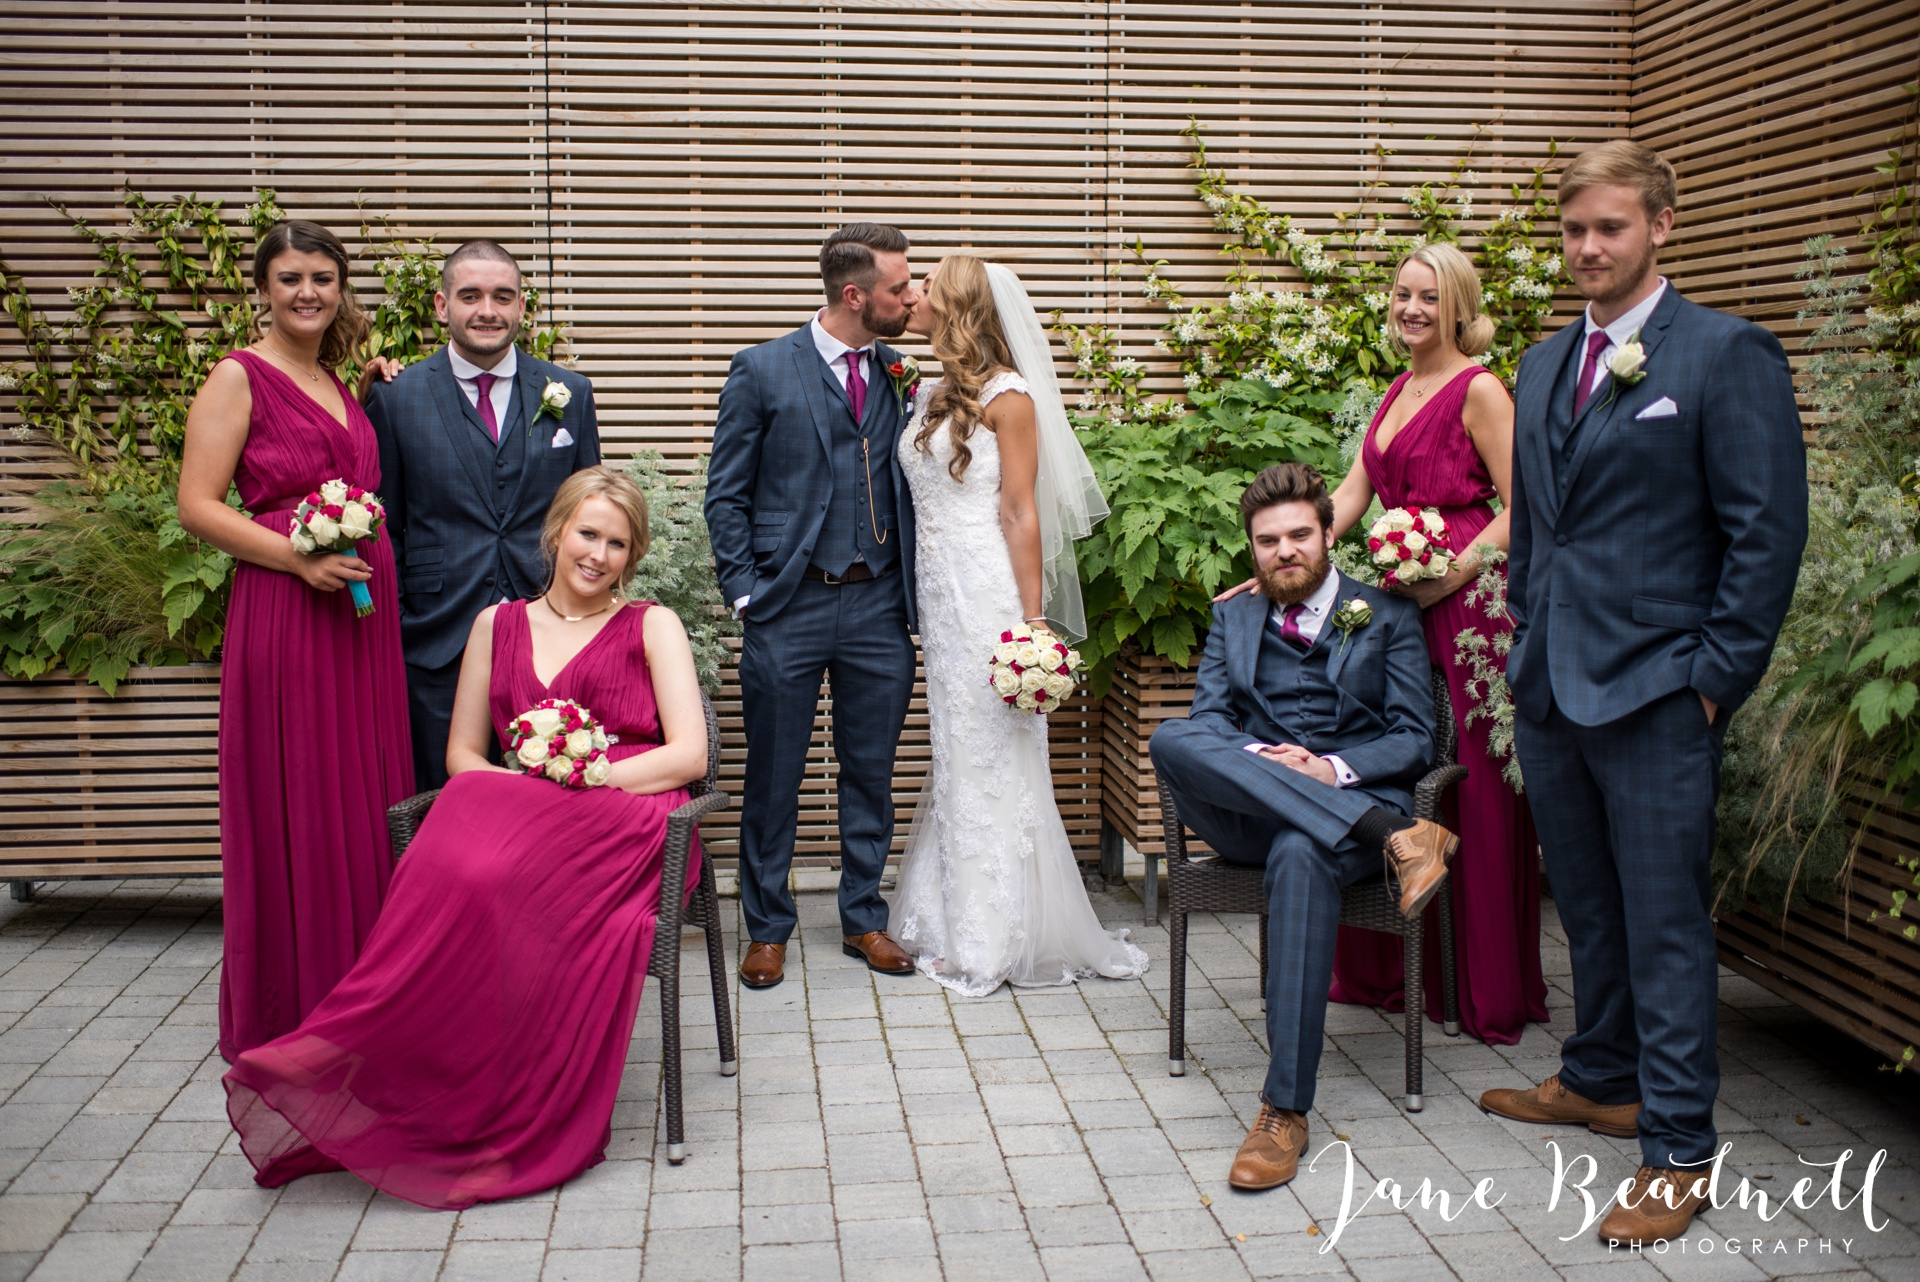 Jane Beadnell fine art wedding photographer Harrogate_0002